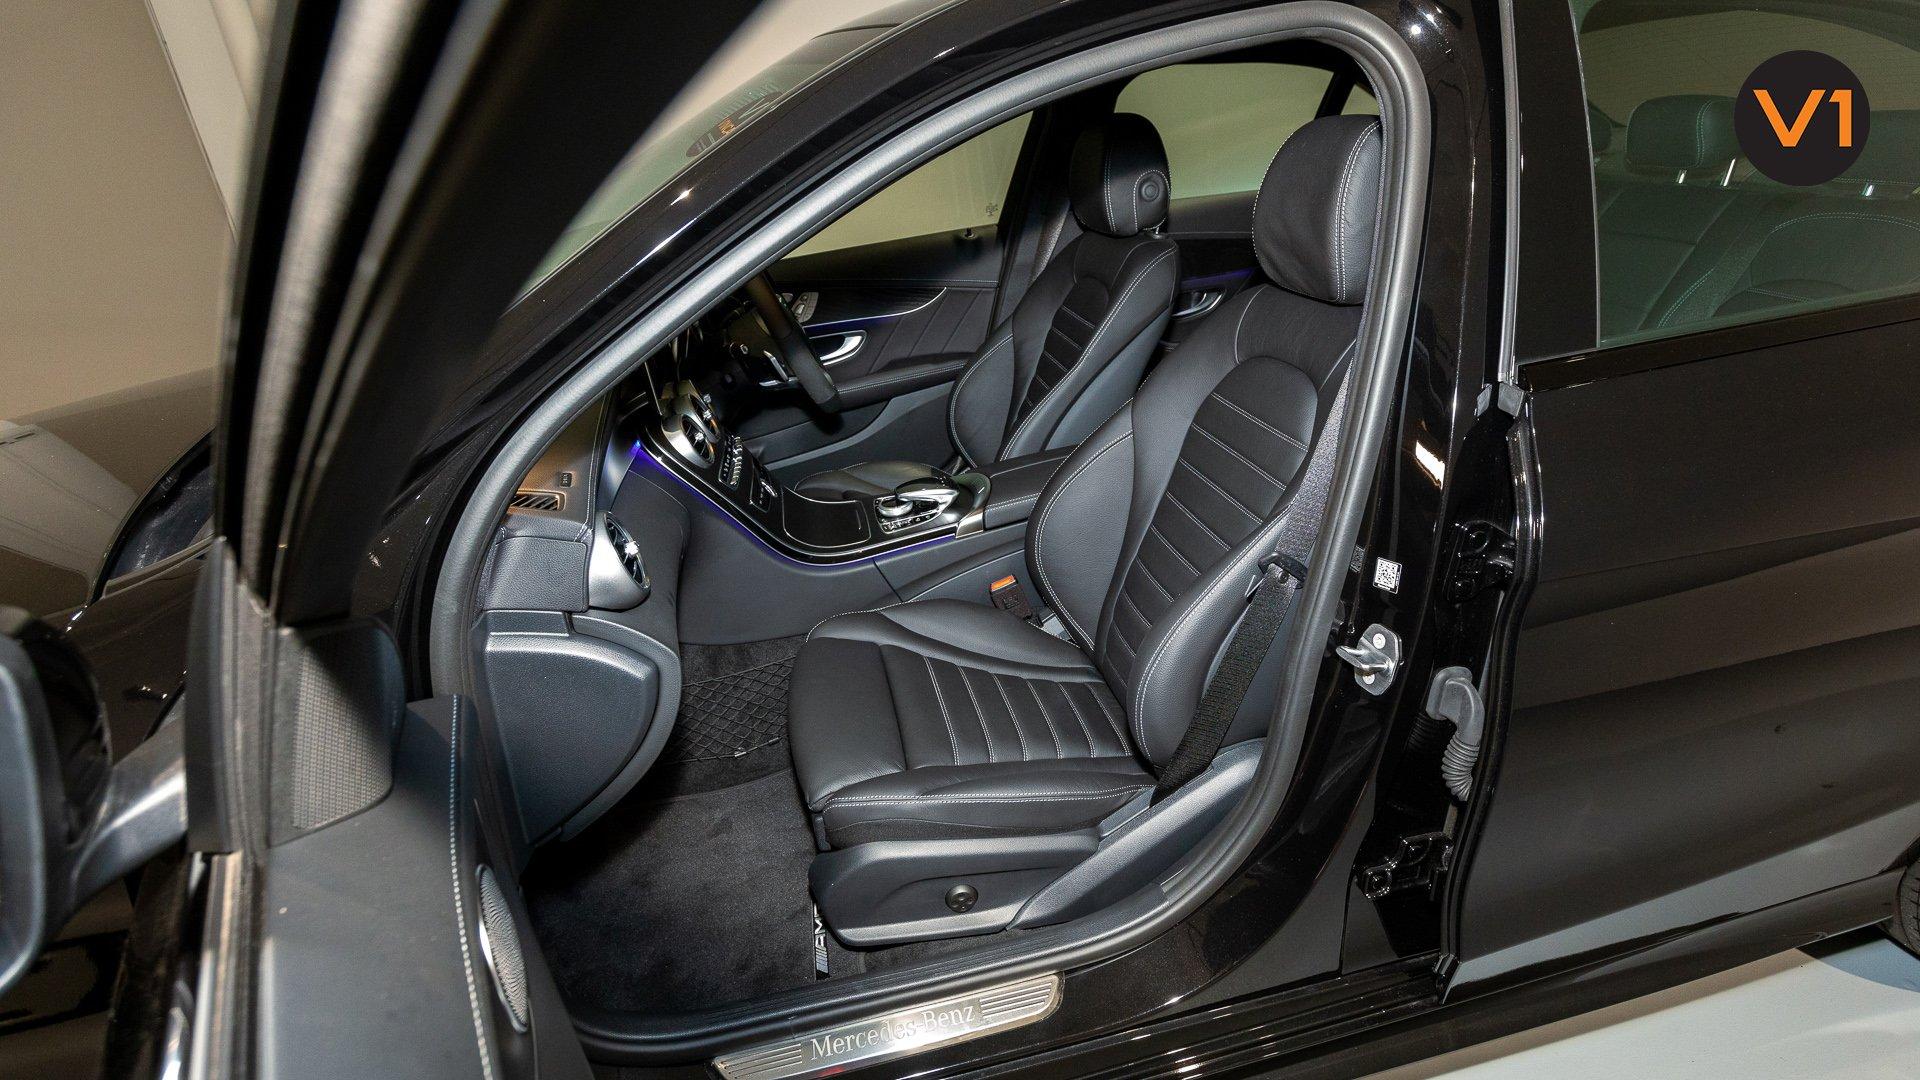 Mercedes-Benz C200 Saloon AMG Premium Night Edition - Front Passenger Seat